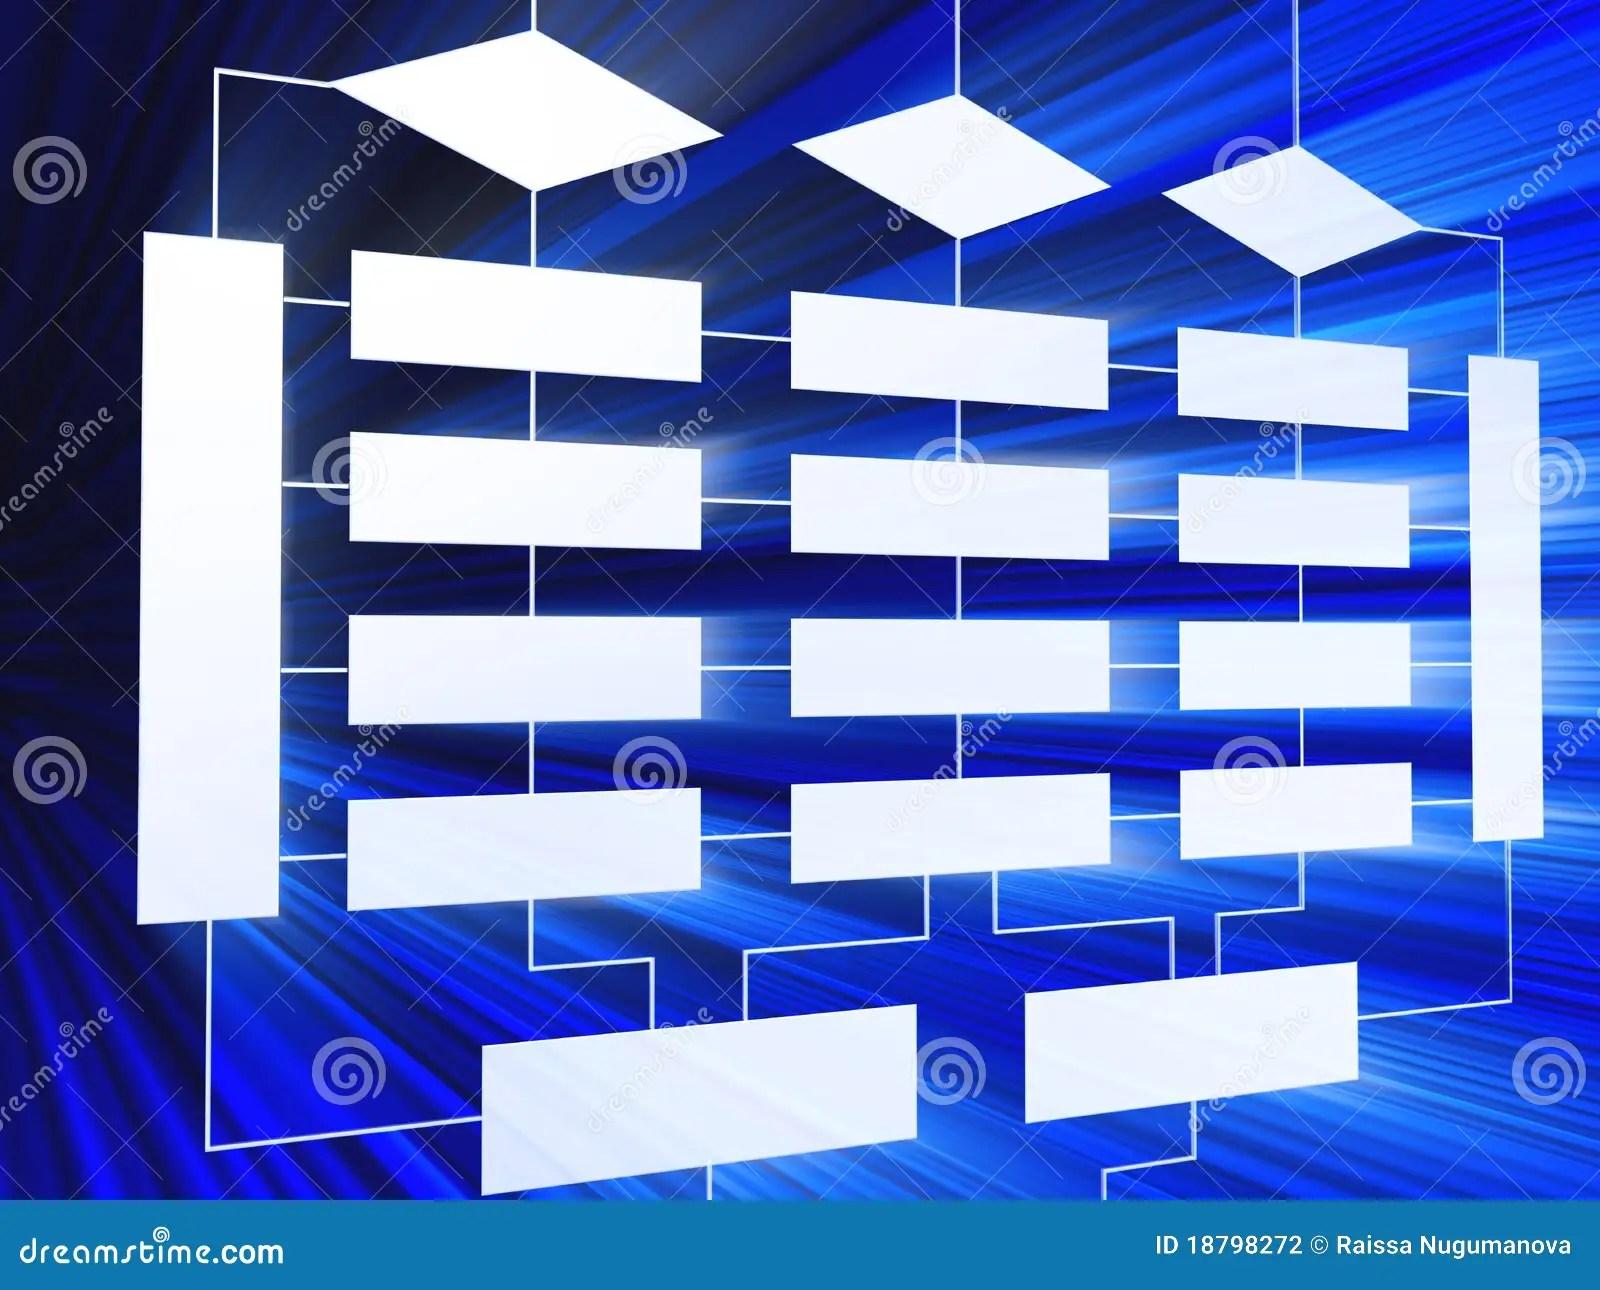 hight resolution of 3d blue business block diagram